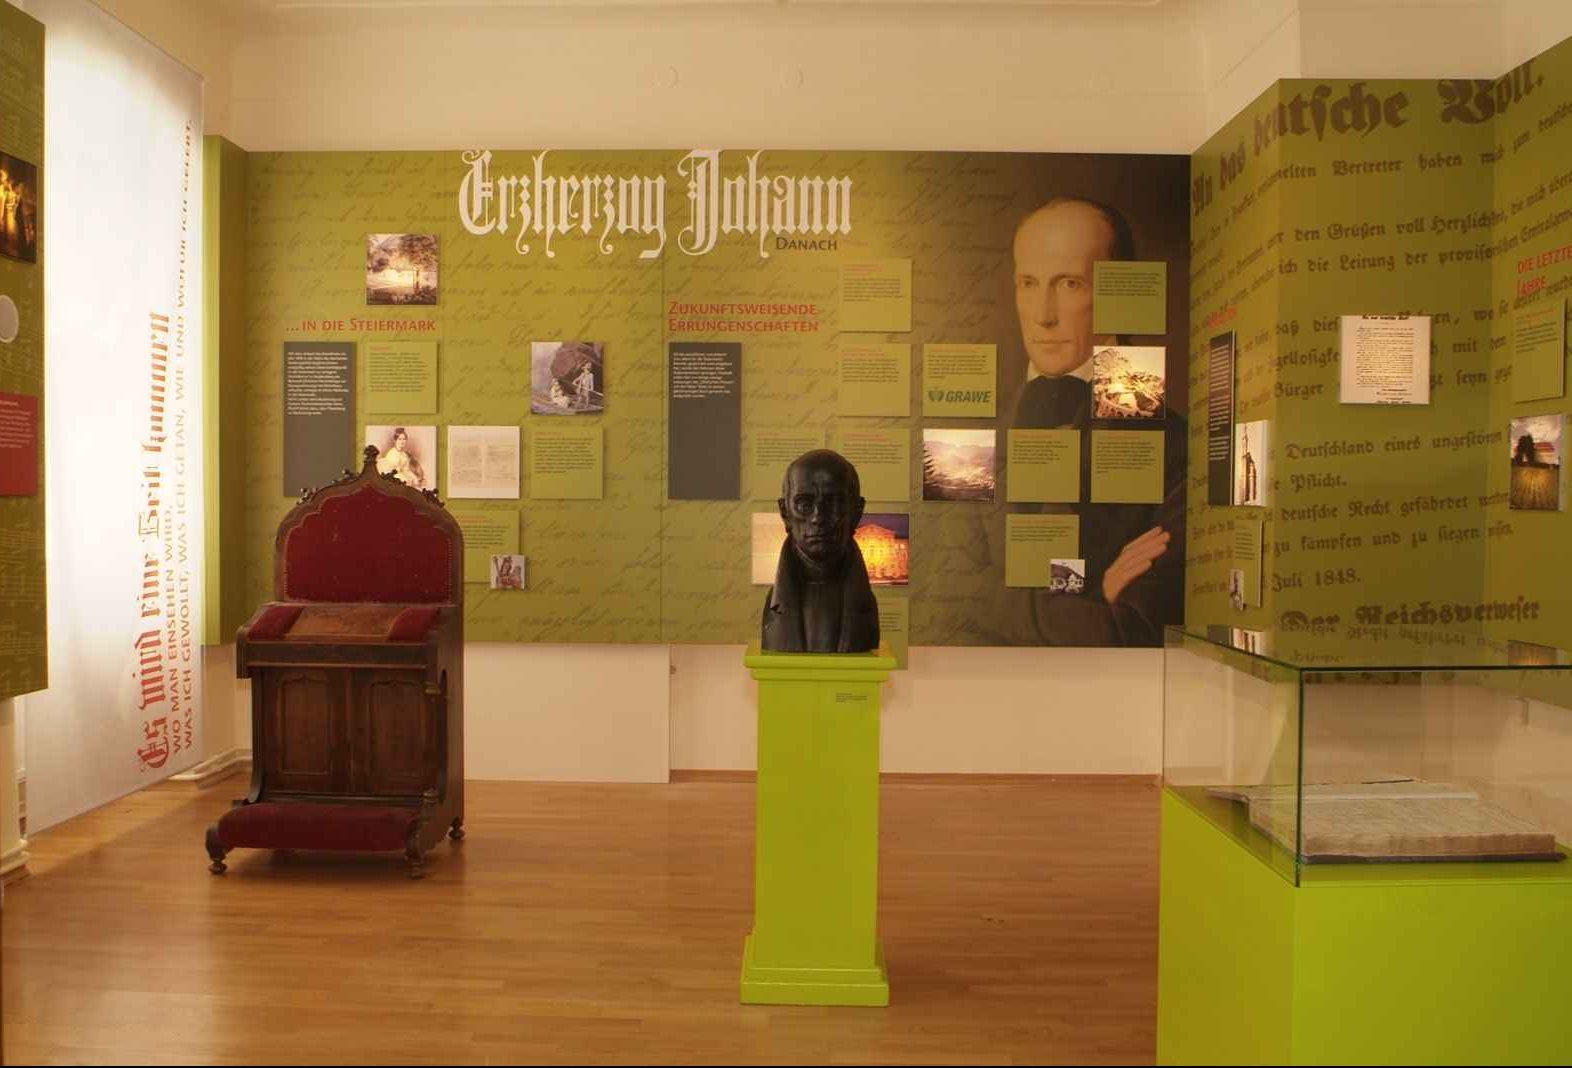 Pfarrhaus Erzherzog Johann